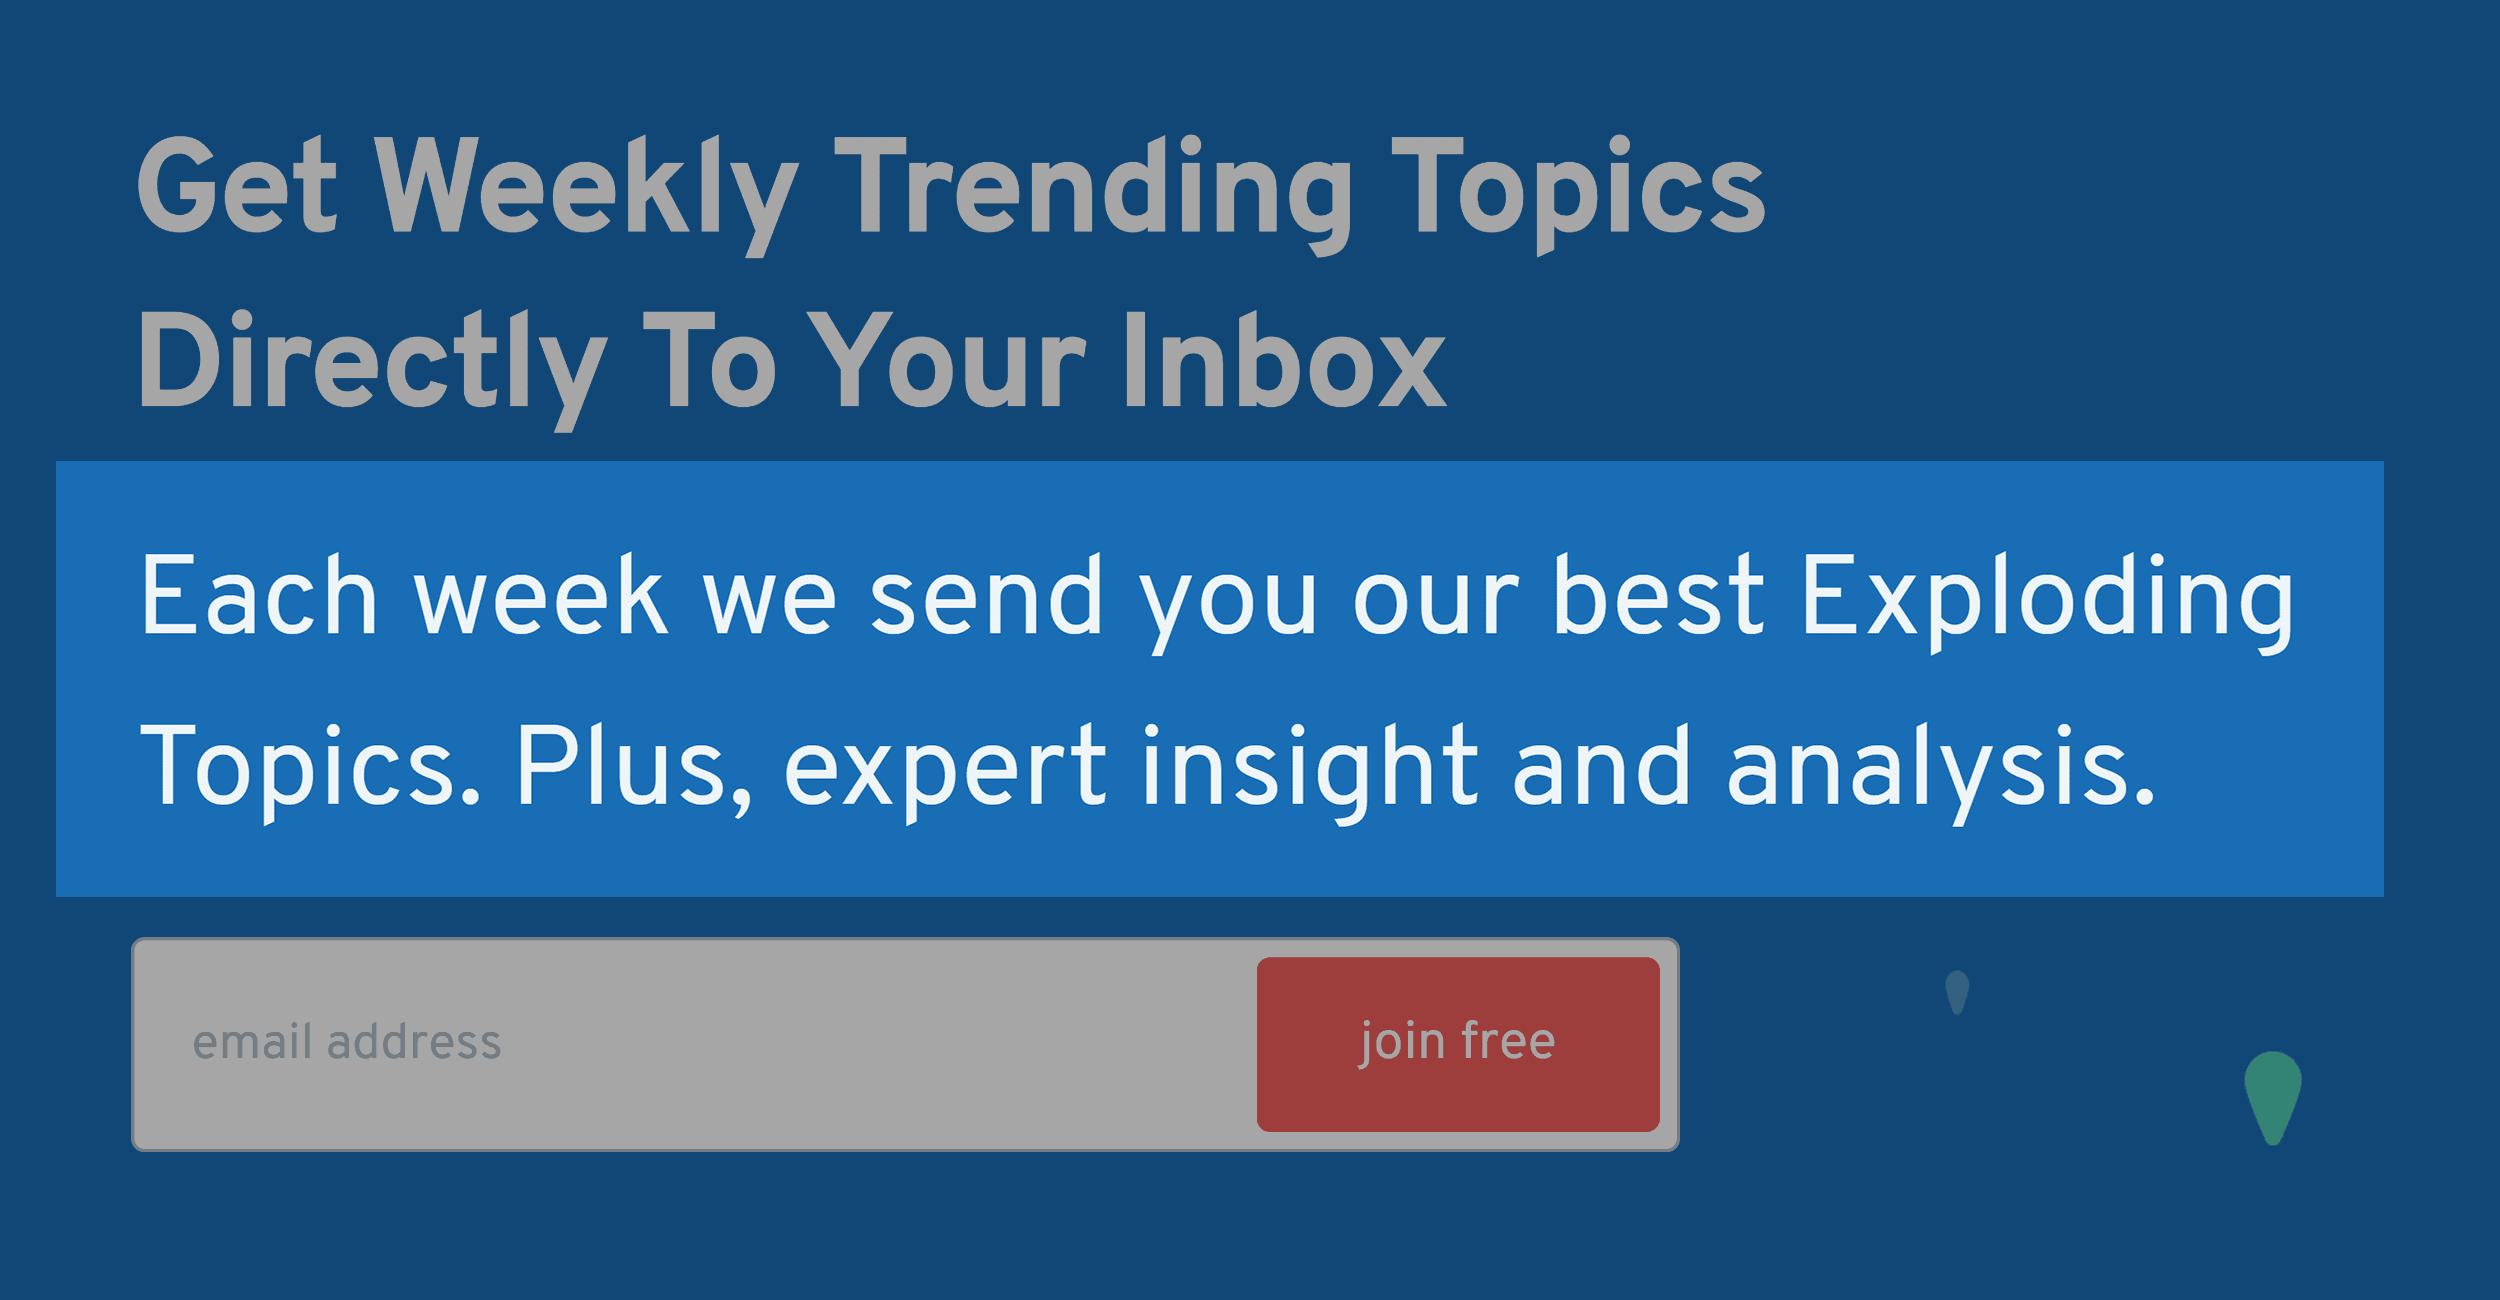 Explodingtopics - Newsletter Signup Subheadline